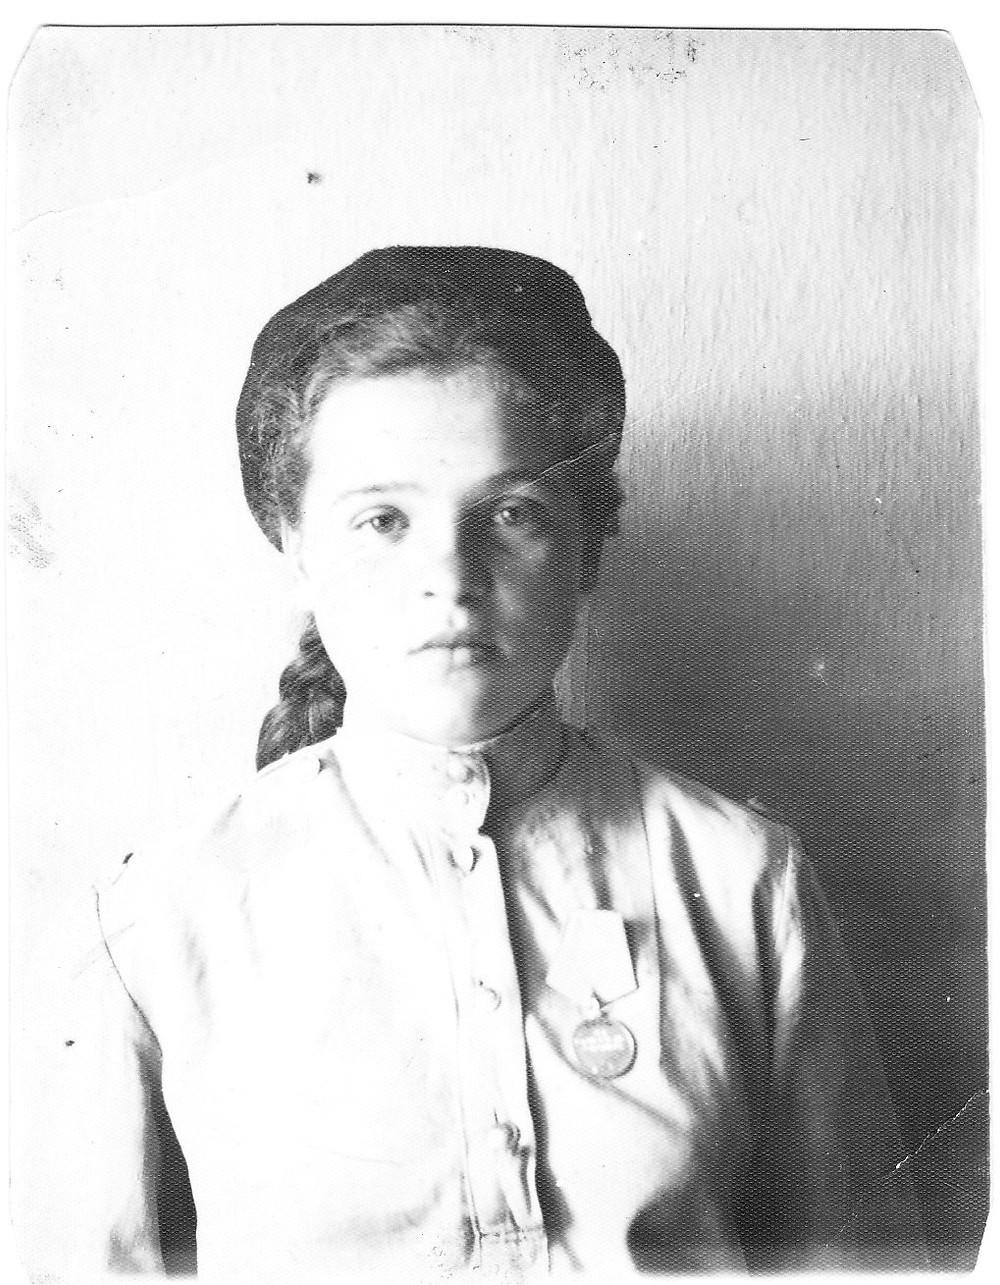 Элине 14 лет, октябрь 1944 год,  1-я медаль